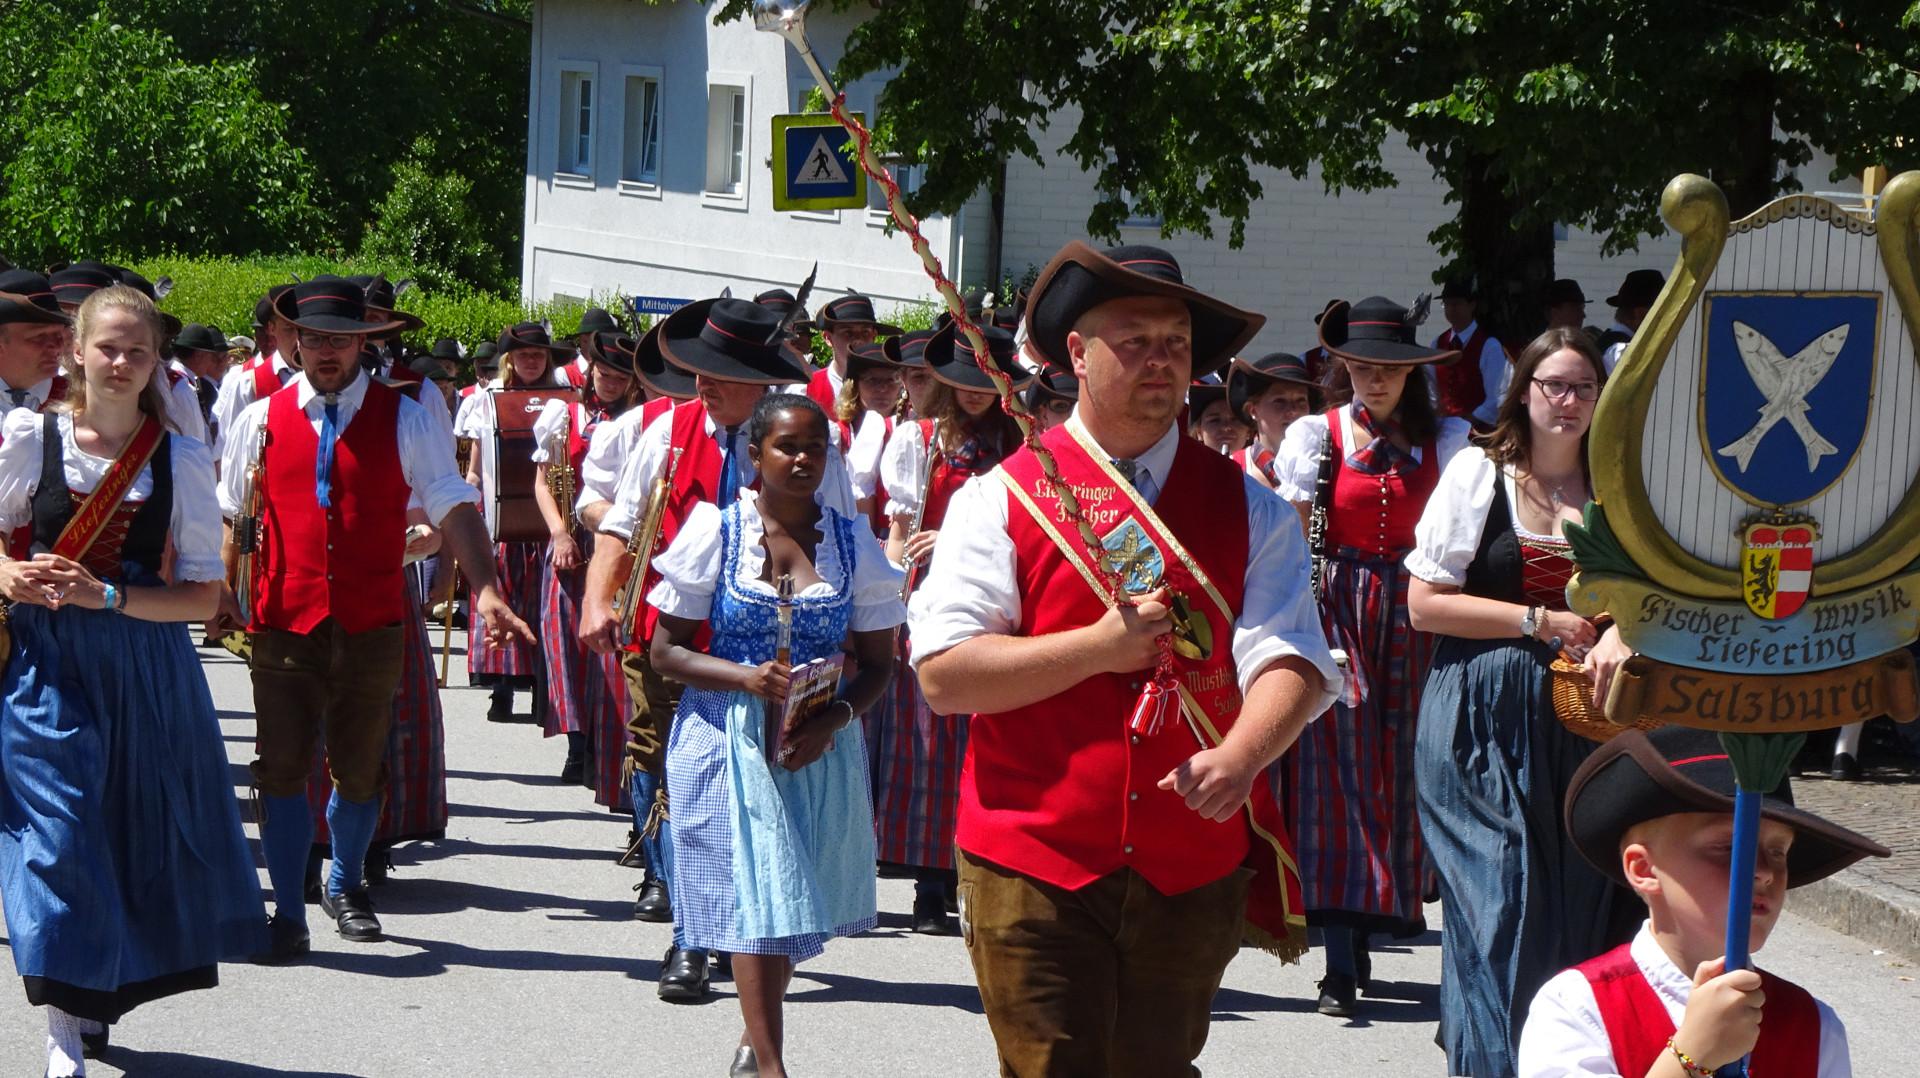 Musikfest Elixhausen